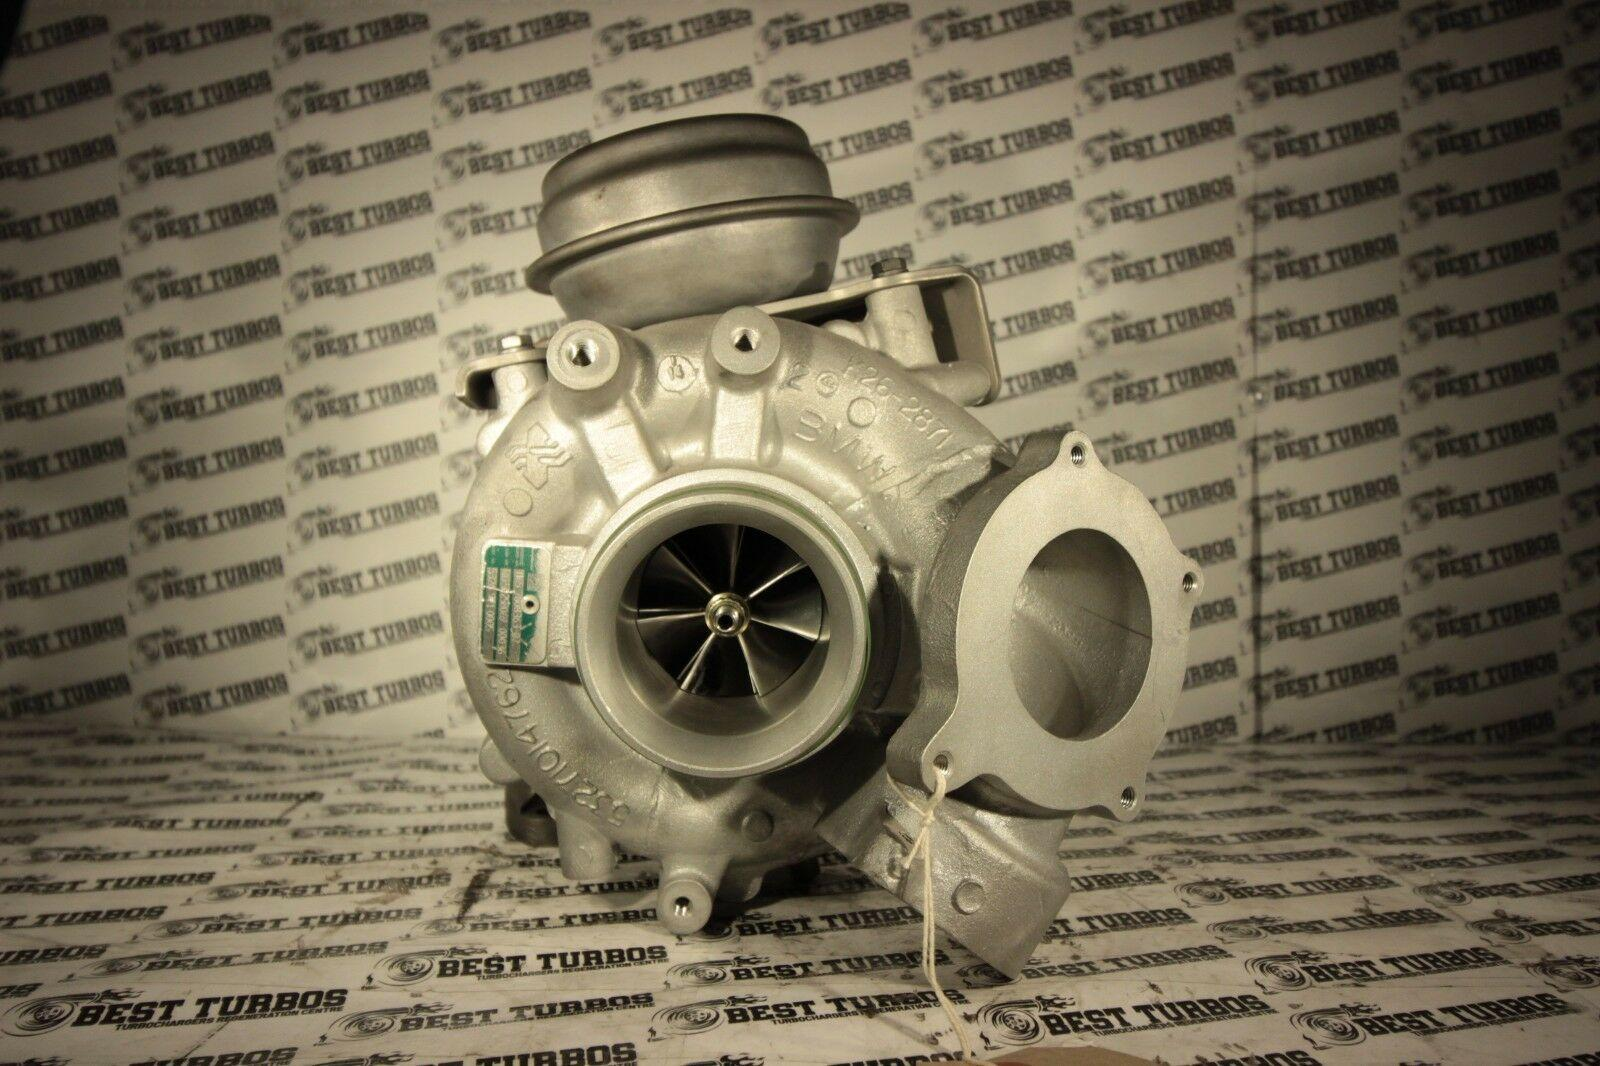 HYBRID-Turbocharger-for-BMW-535d-740d-xd-GT-X5-X6-30-53269700005-163264839498-2